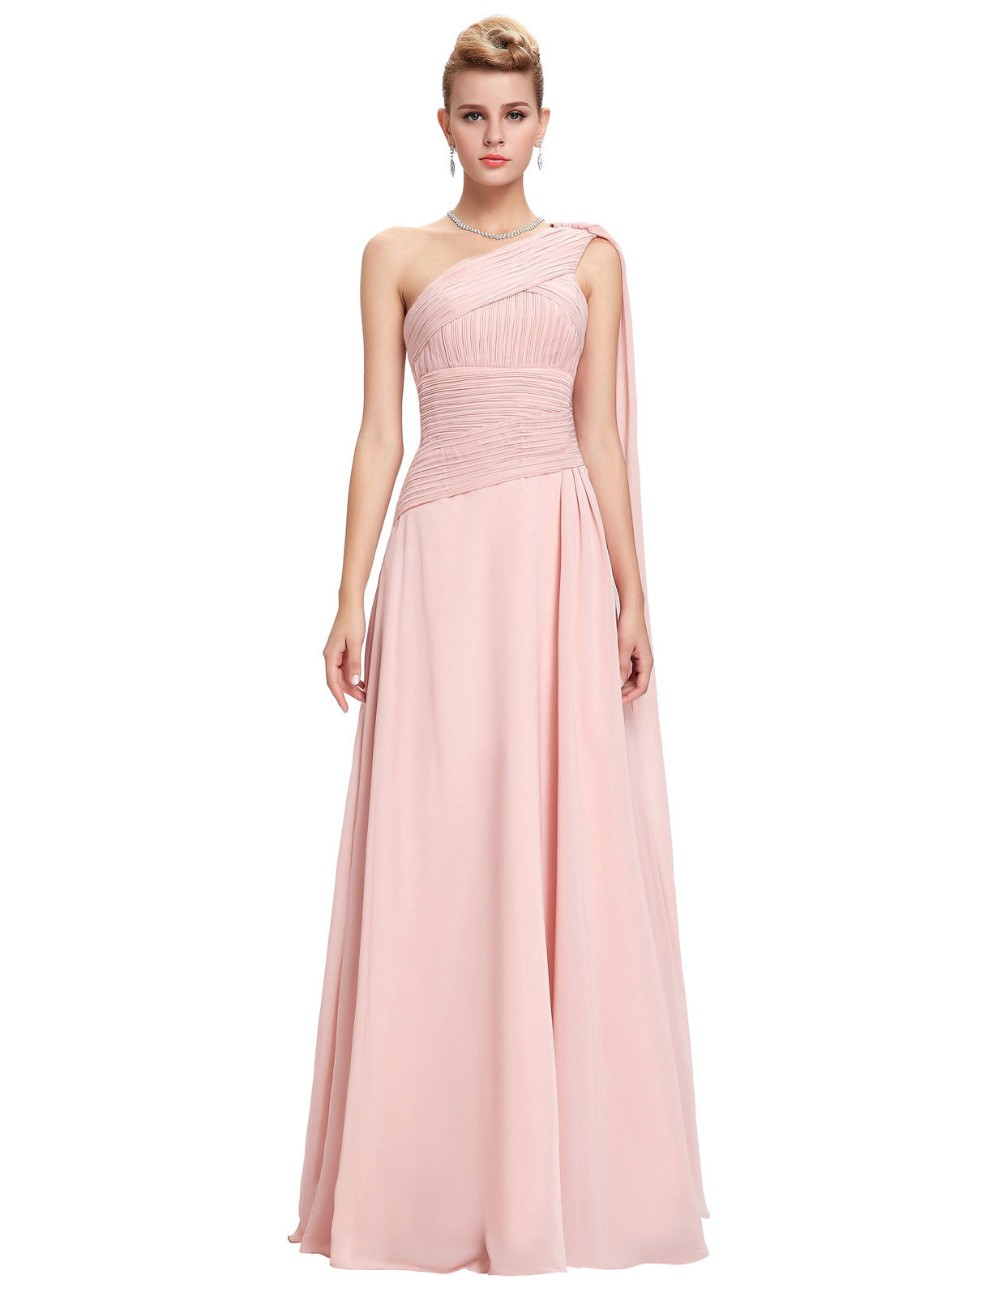 Blush rosa vestidos de dama de grace karin de un hombro vestido de ...